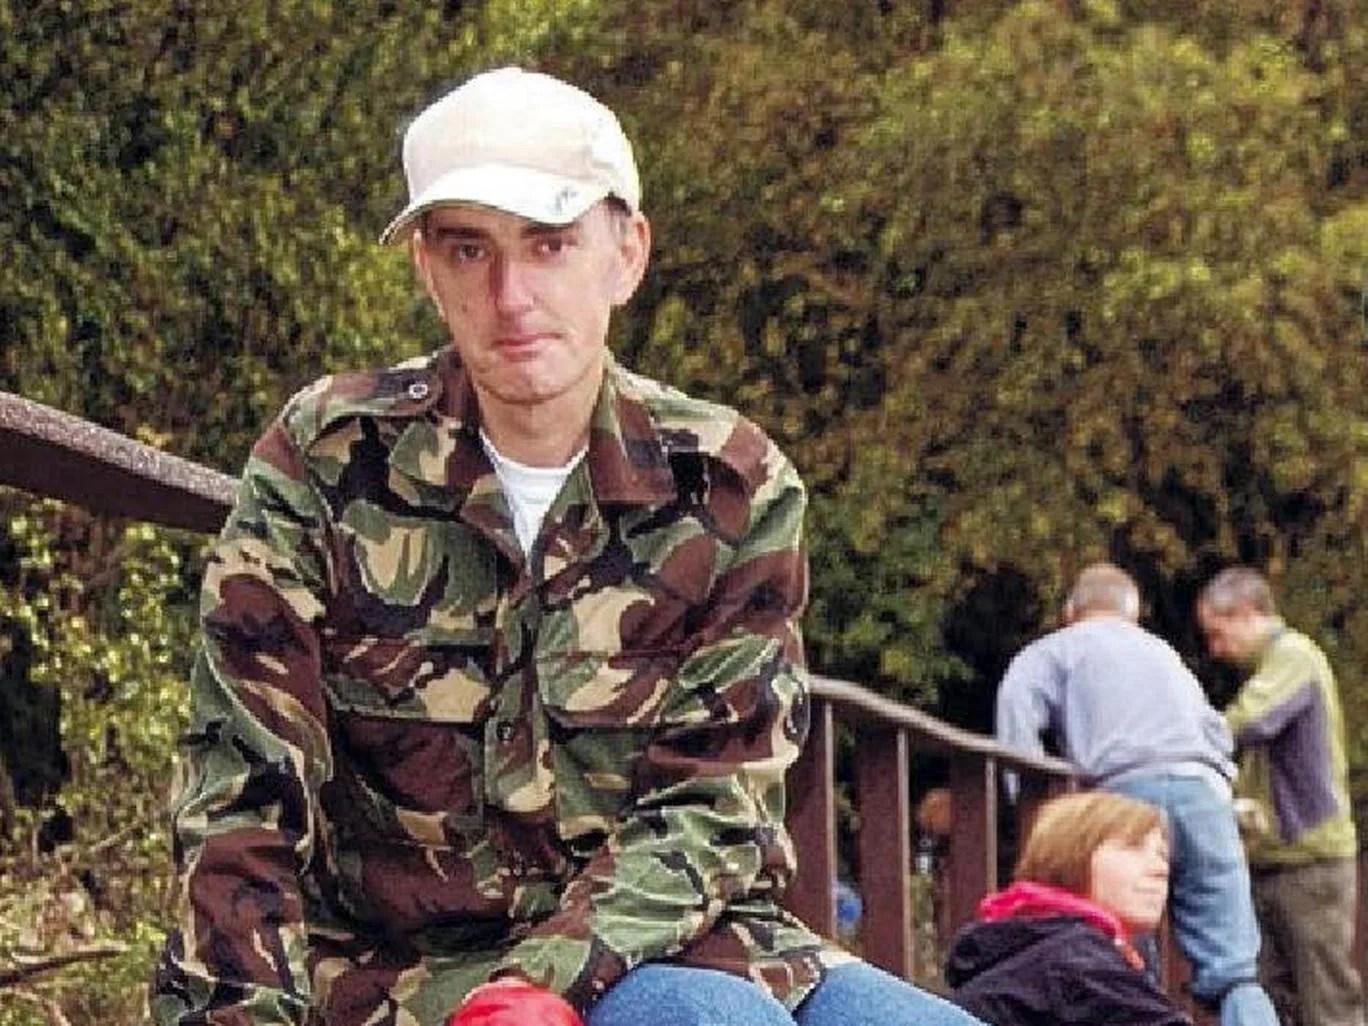 Jo Cox murder suspect Thomas Mair in paramilitary uniform